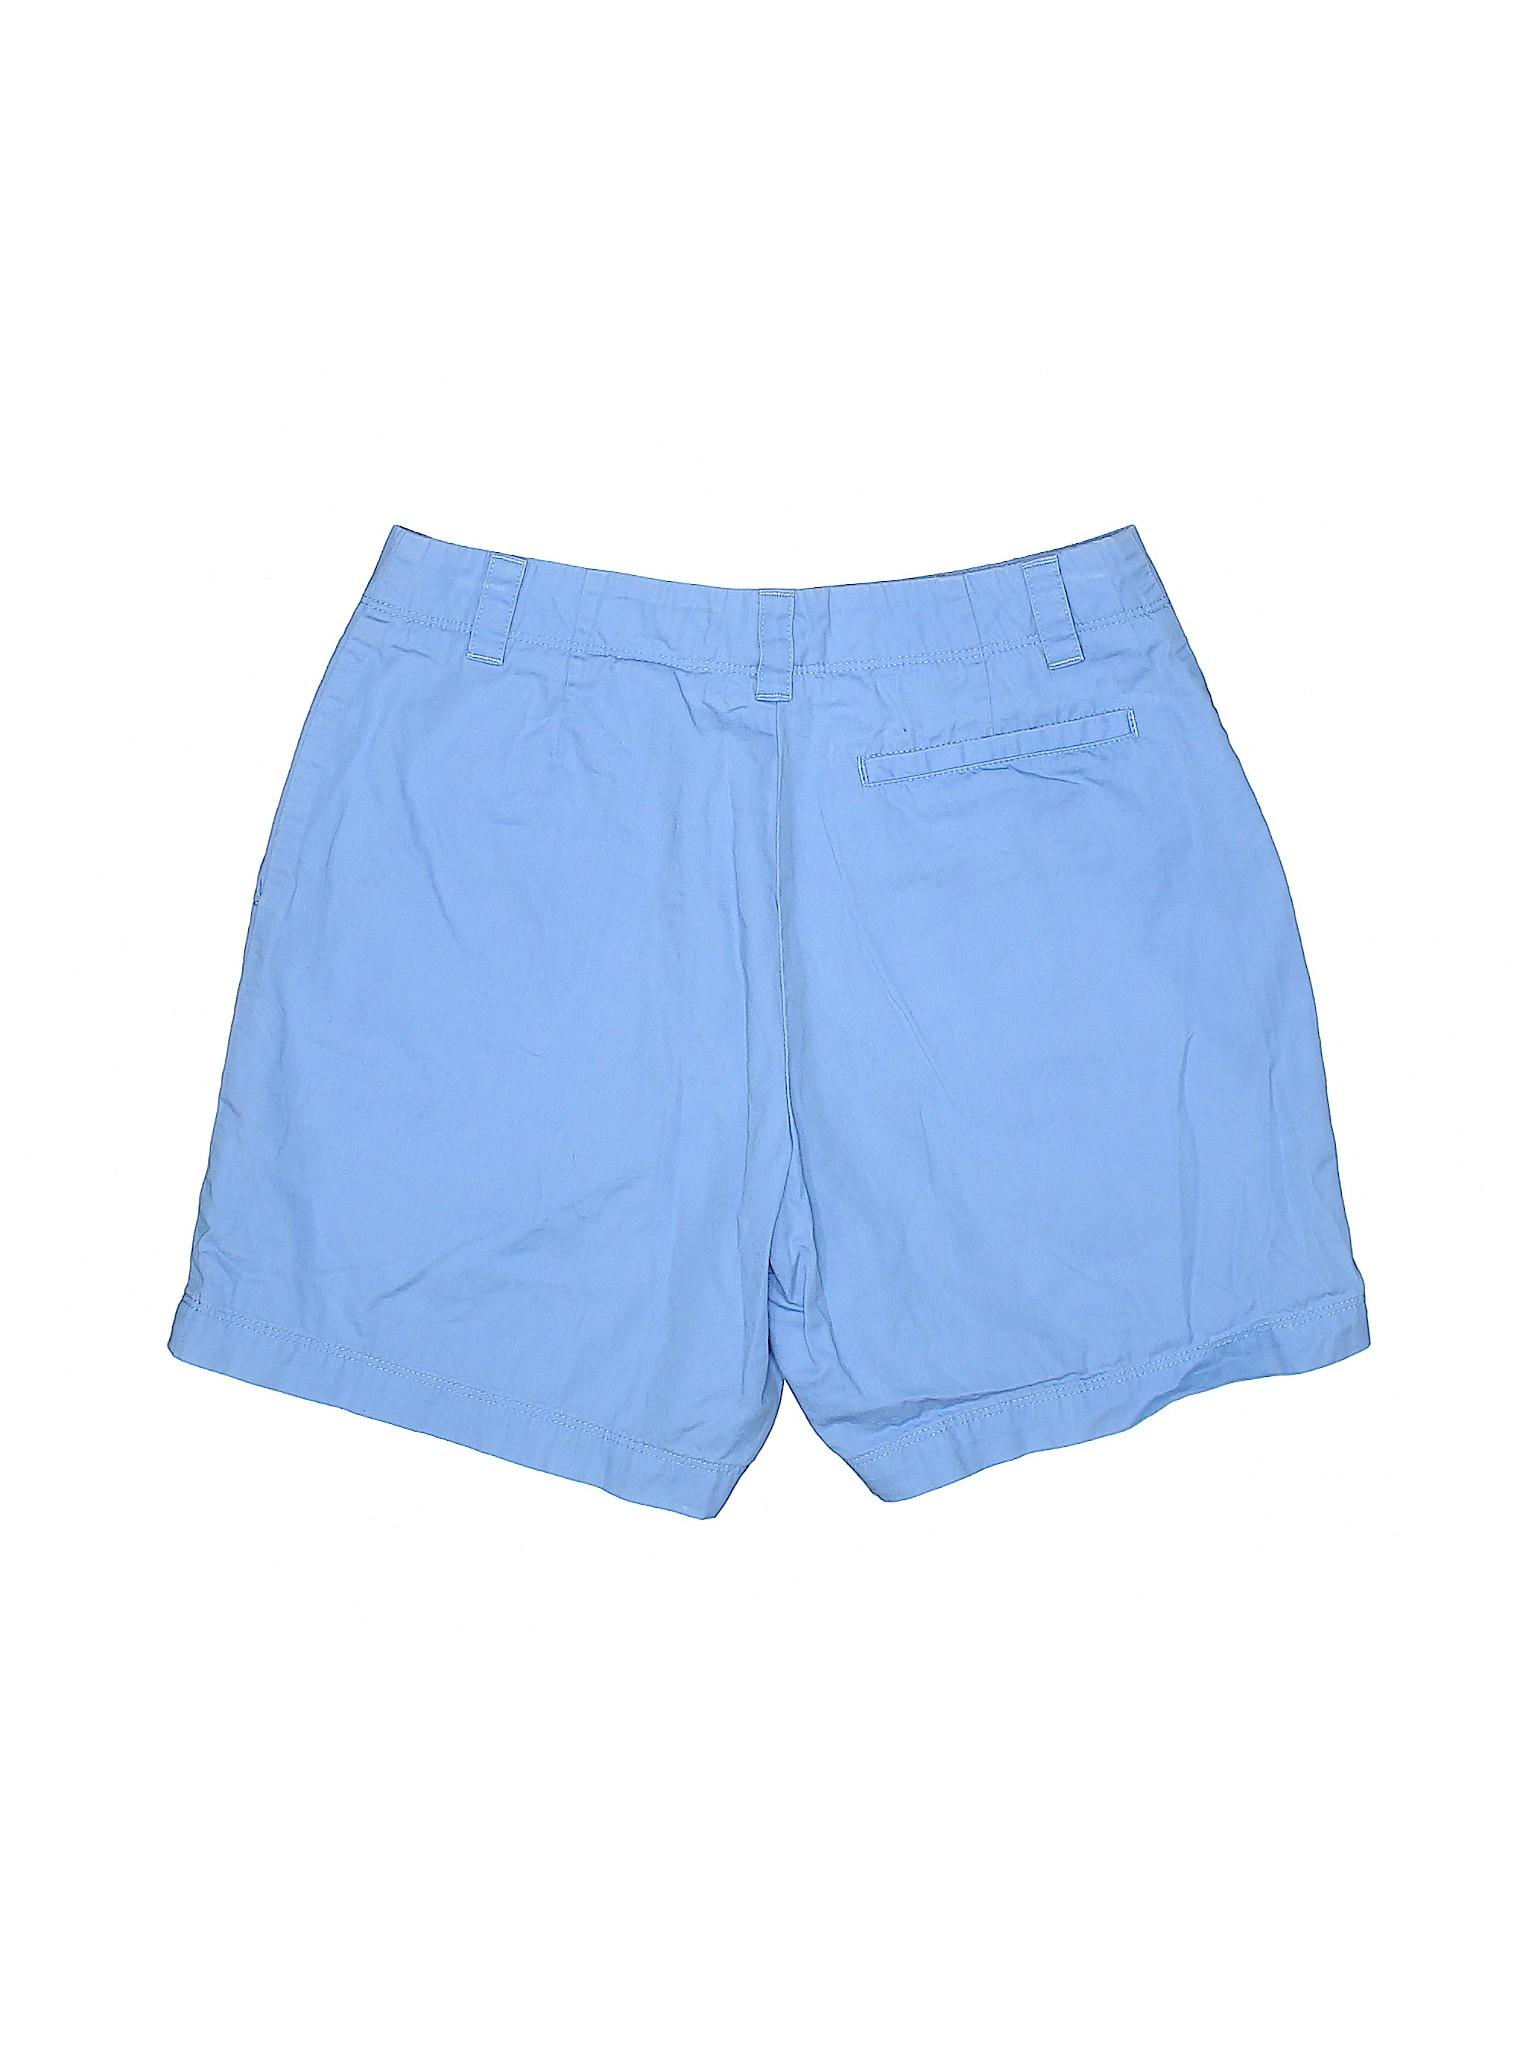 Bauer Khaki Bauer Shorts Boutique Eddie Khaki Eddie Shorts Boutique Boutique Eddie qgp7Ez6w